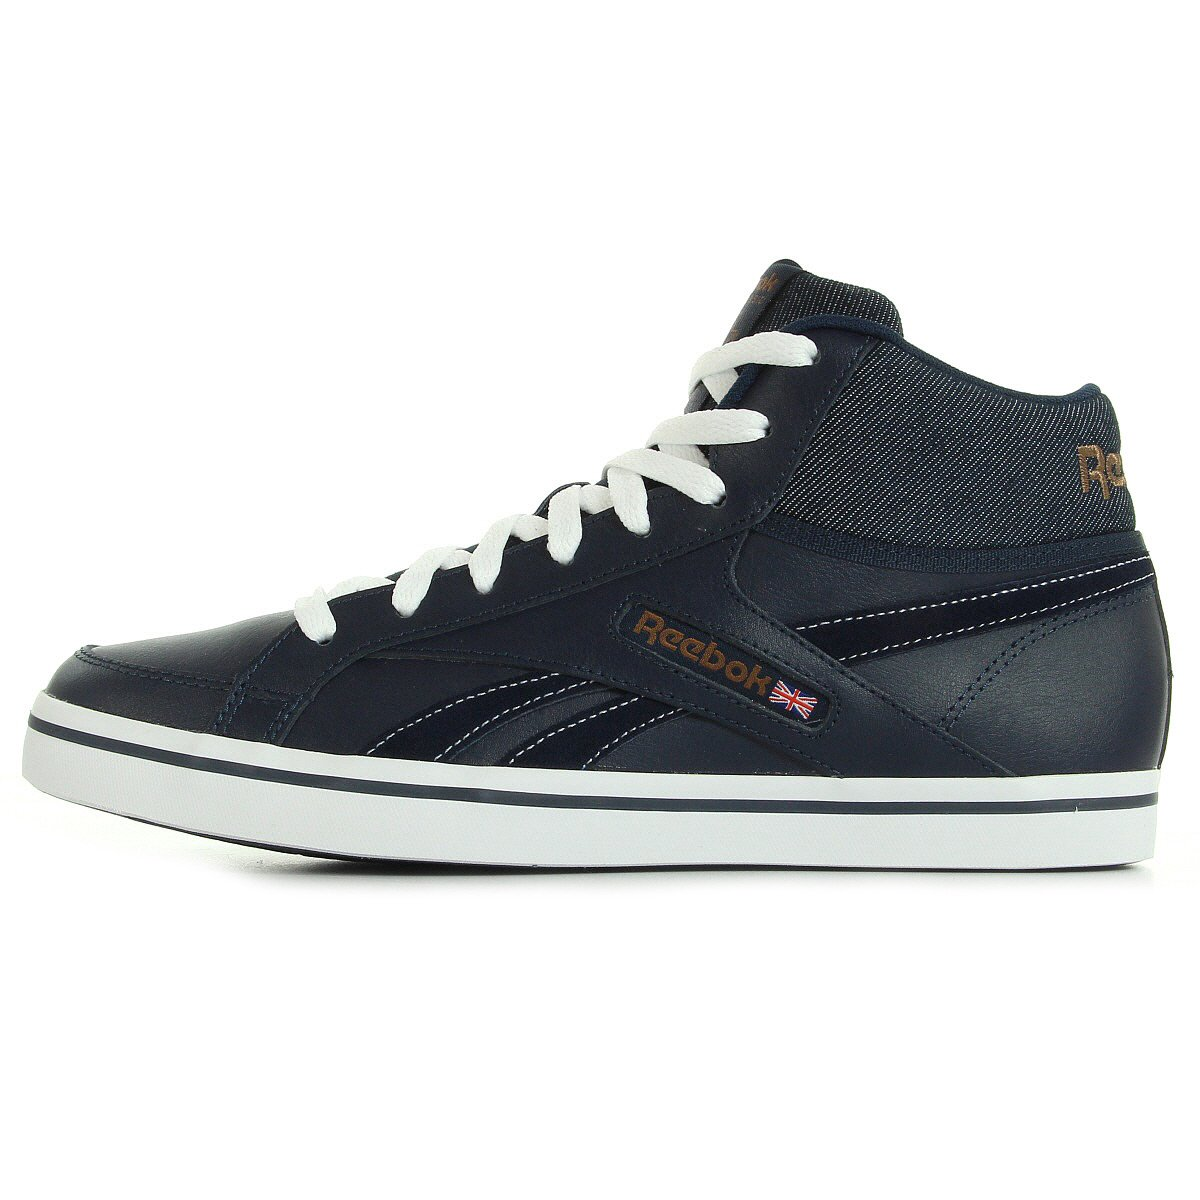 Reebok LC COURT VULC MID M47934, Herren Sneaker  385 EU